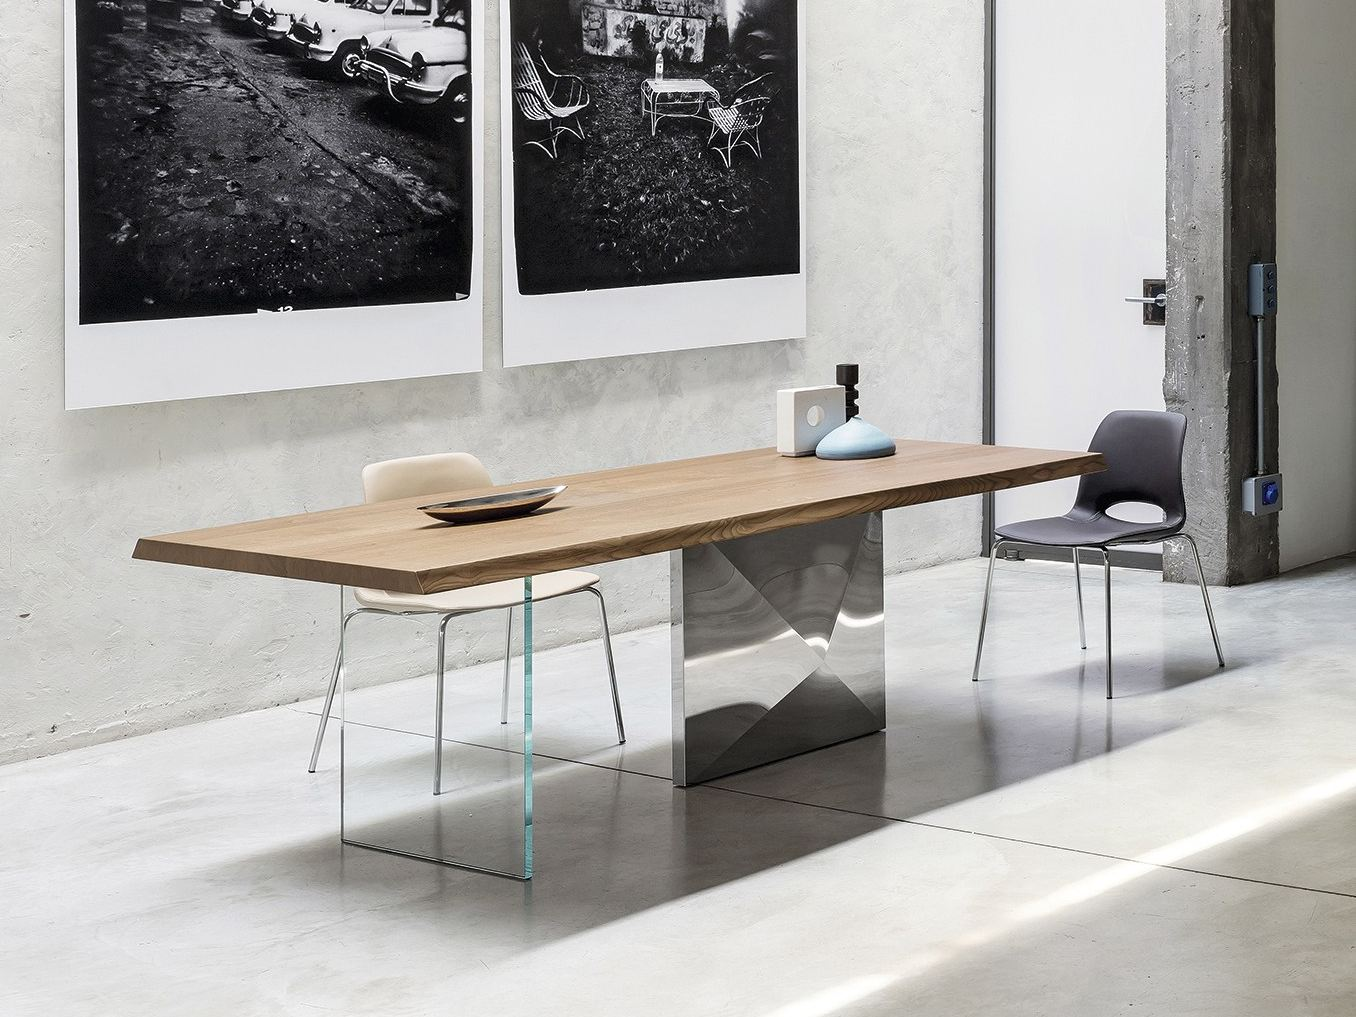 Tavoli e Sedie RIFLESSI   Archiproducts